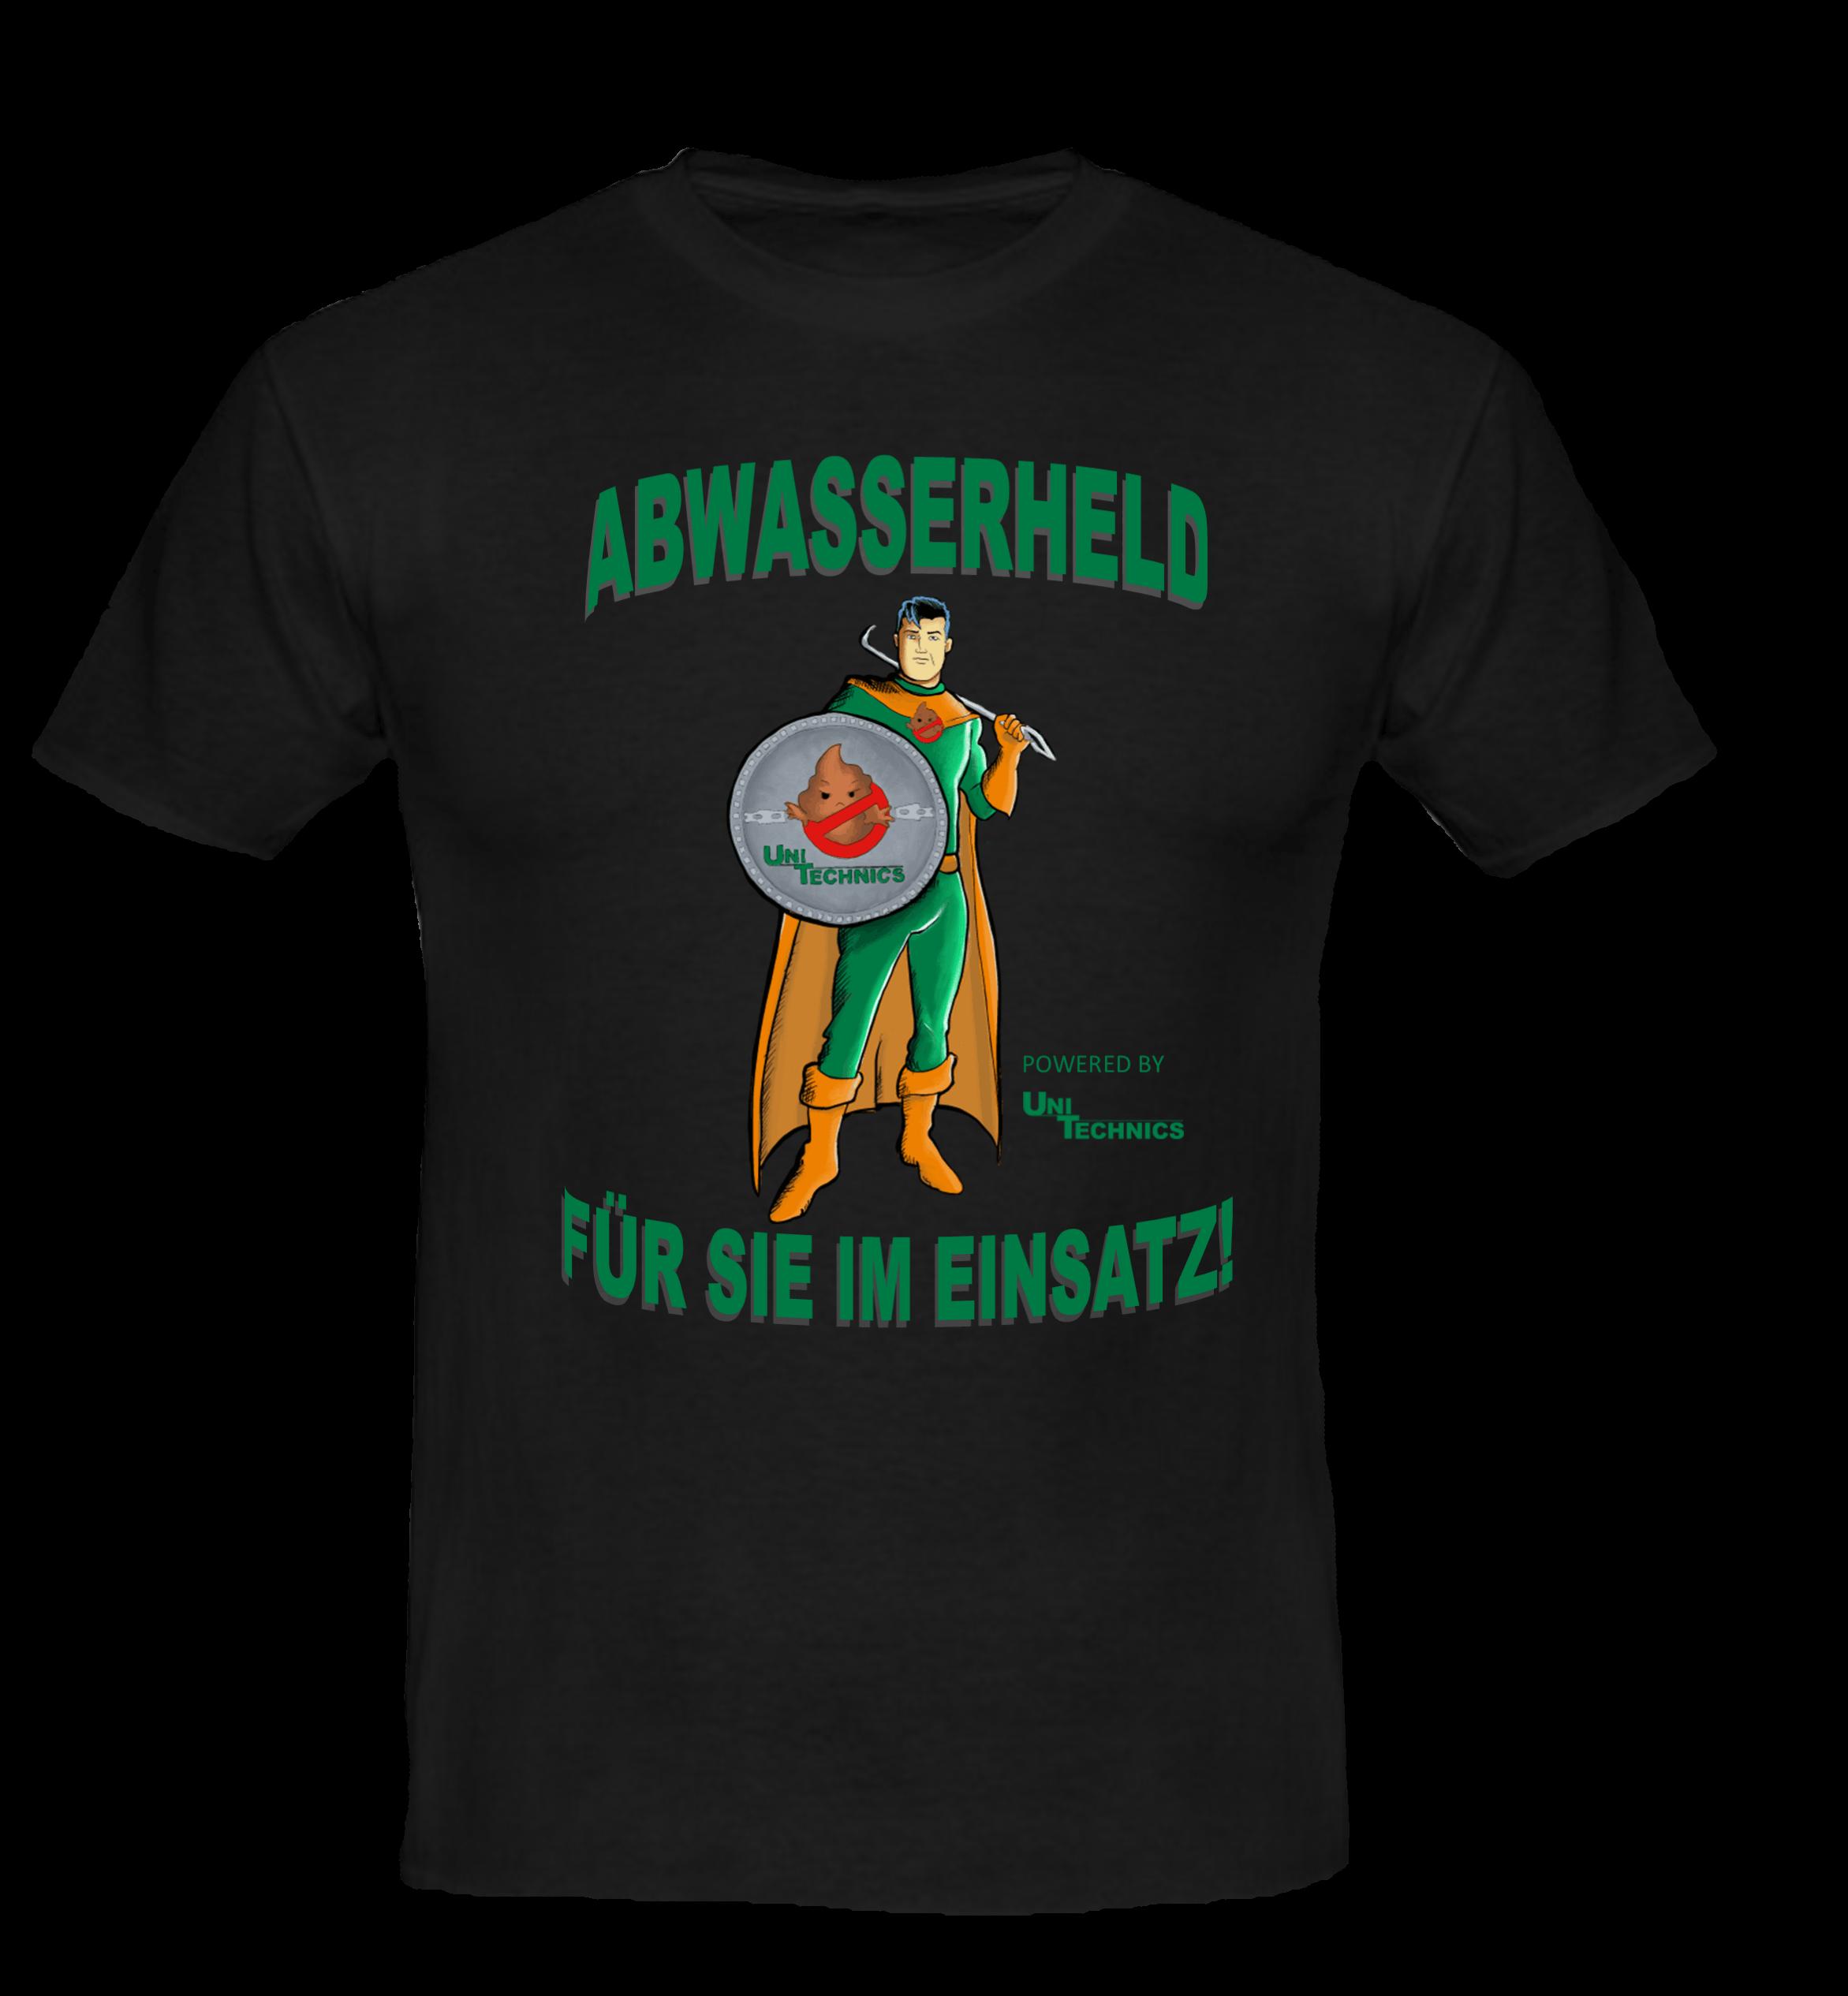 UNITECHNICS Arbeits-T-Shirt AWH - schwarz